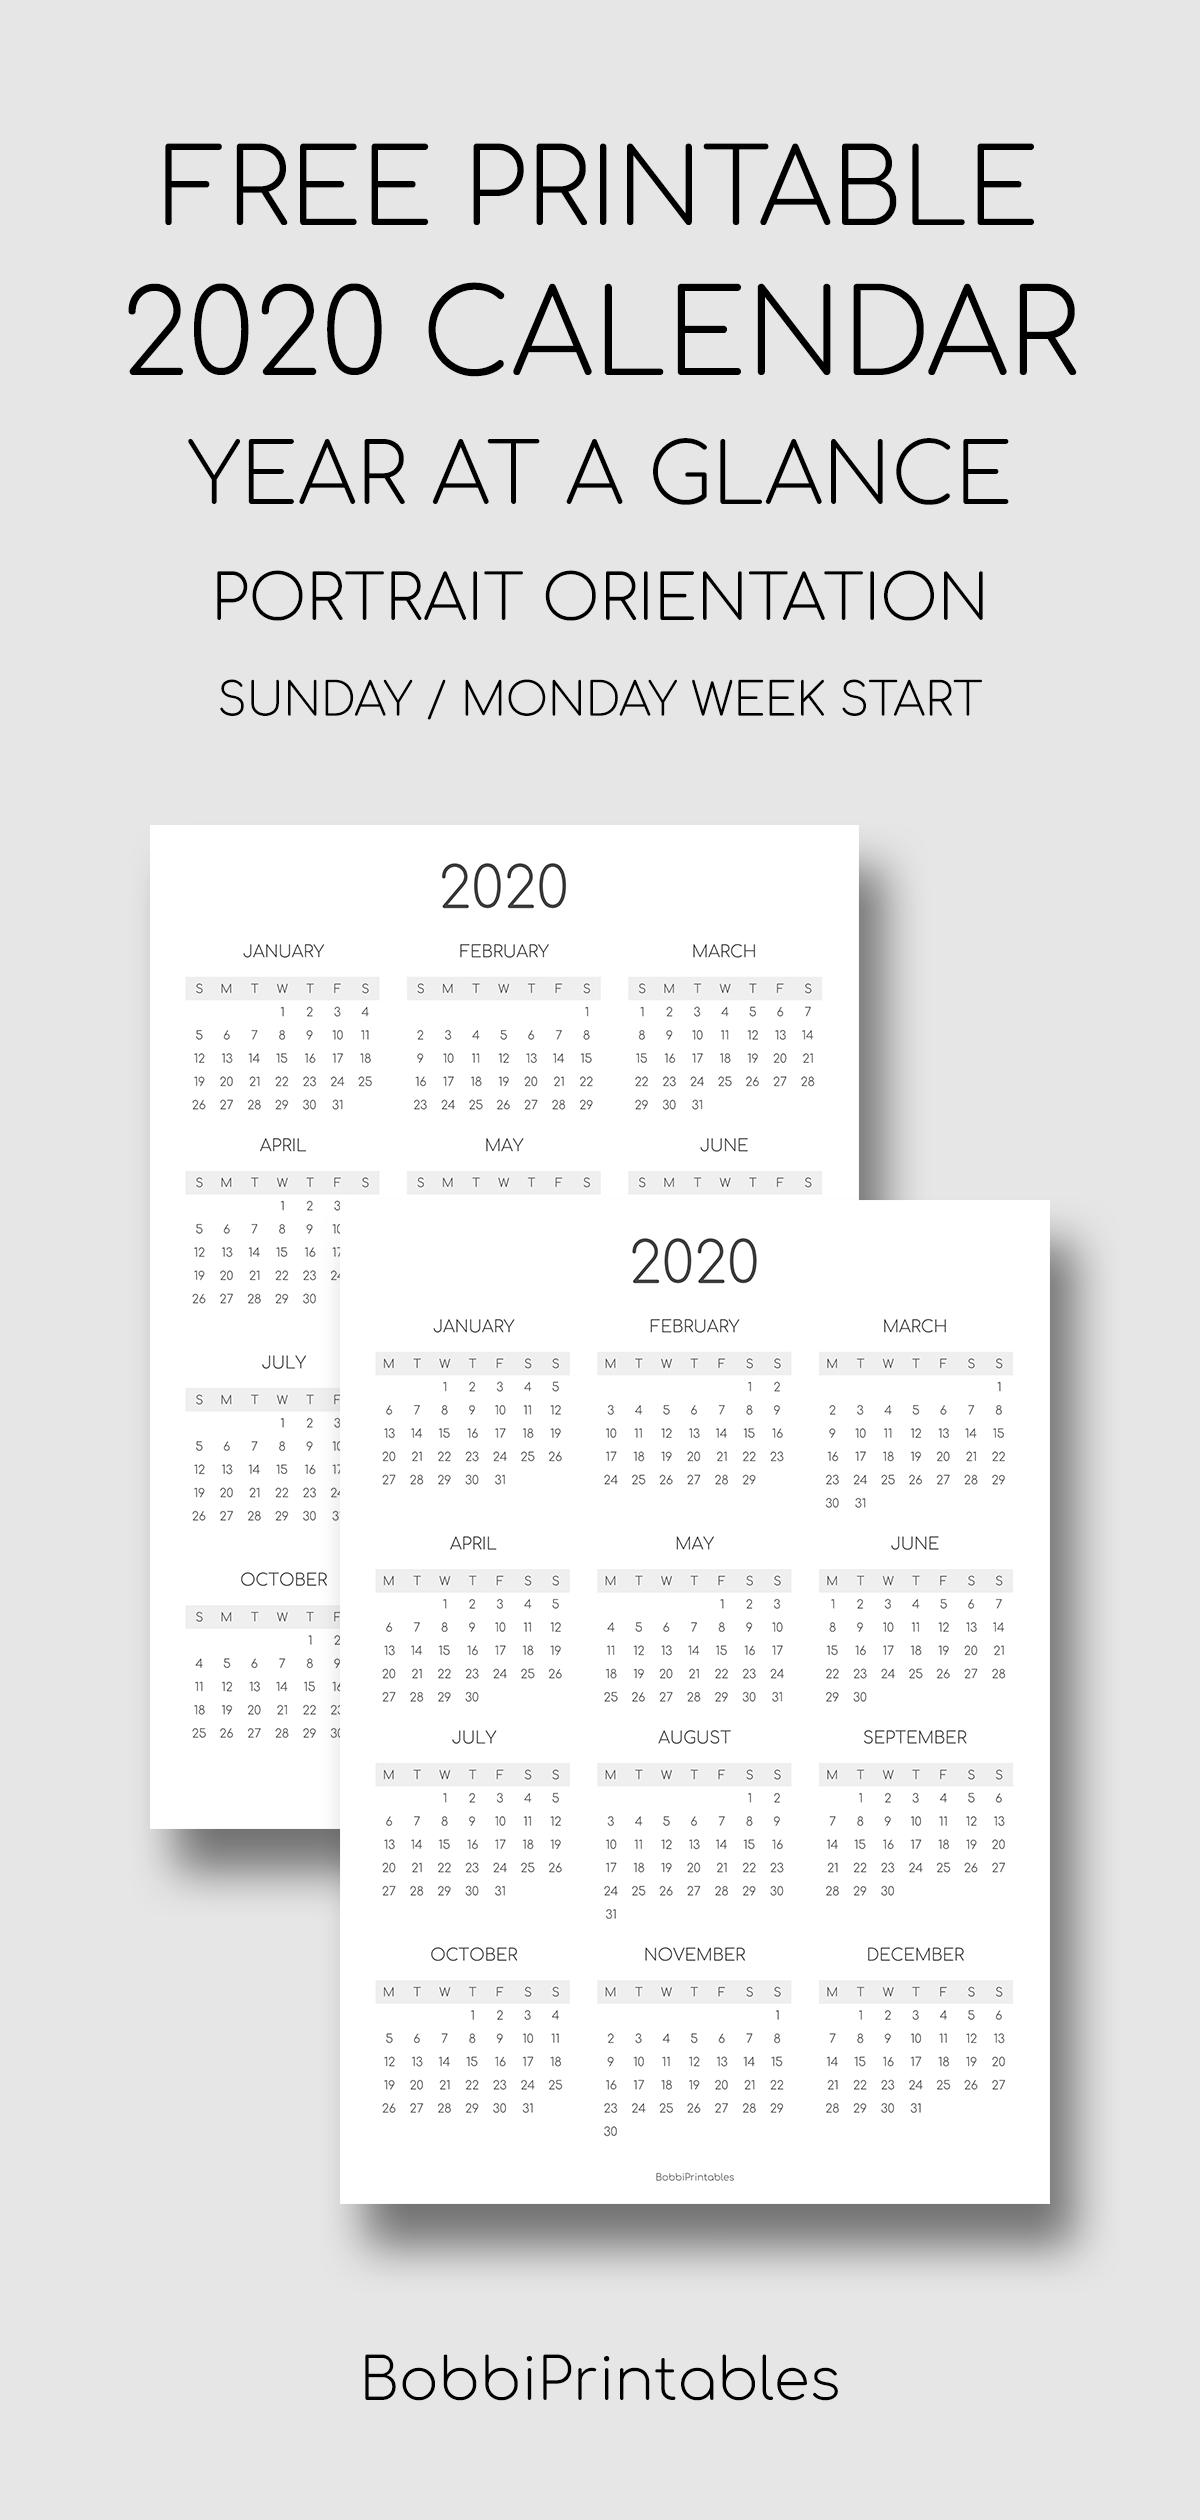 Printable 2020 Calendar - Portrait | At A Glance Calendar pertaining to 2020 Calendar At A Glance Printable